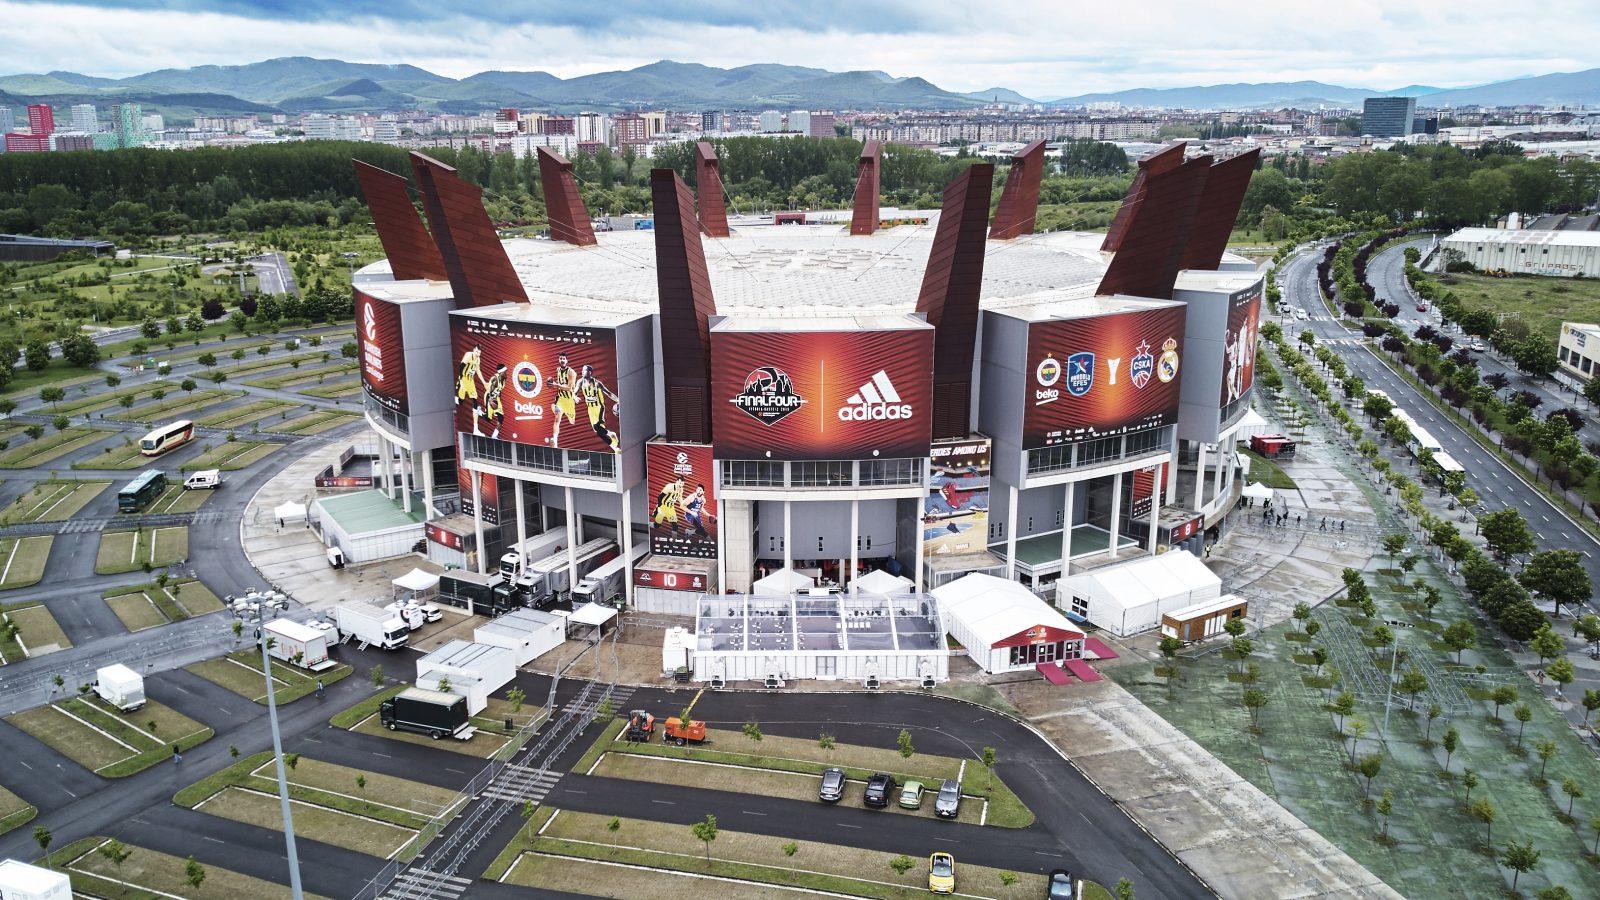 Aerial view of Fernando Buesa Arena during Euroleague Basketball Final Four